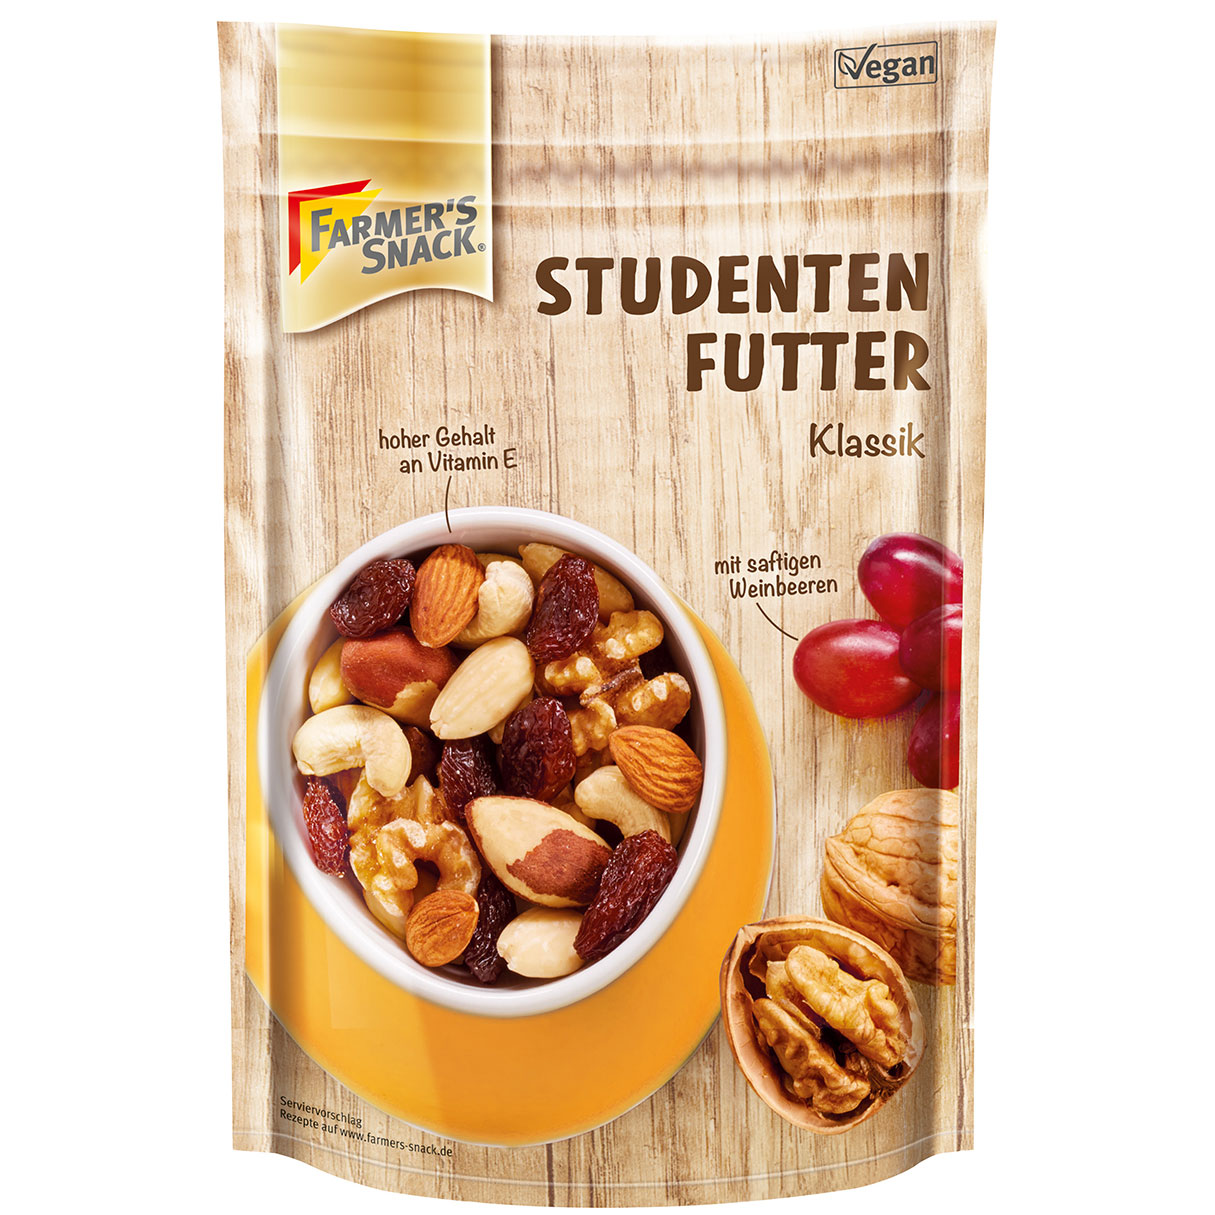 Farmer\'s Snack Studentenfutter Klassik 200g | Online kaufen im World ...